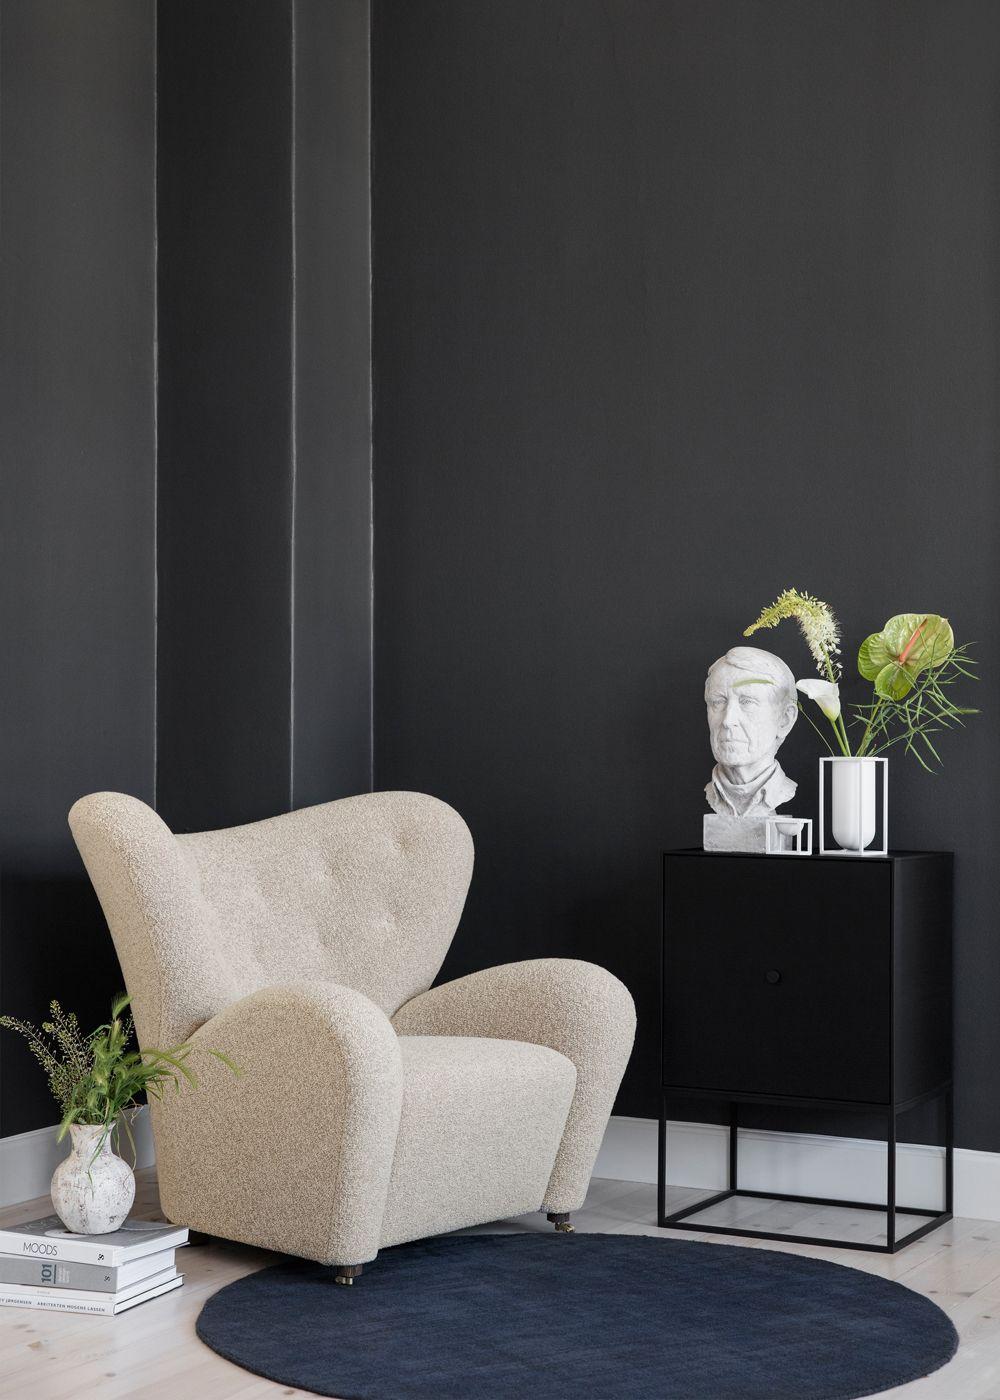 by Lassen - Den Trætte Mand Lænestol - Nubuck - Lænestol i brunt stof